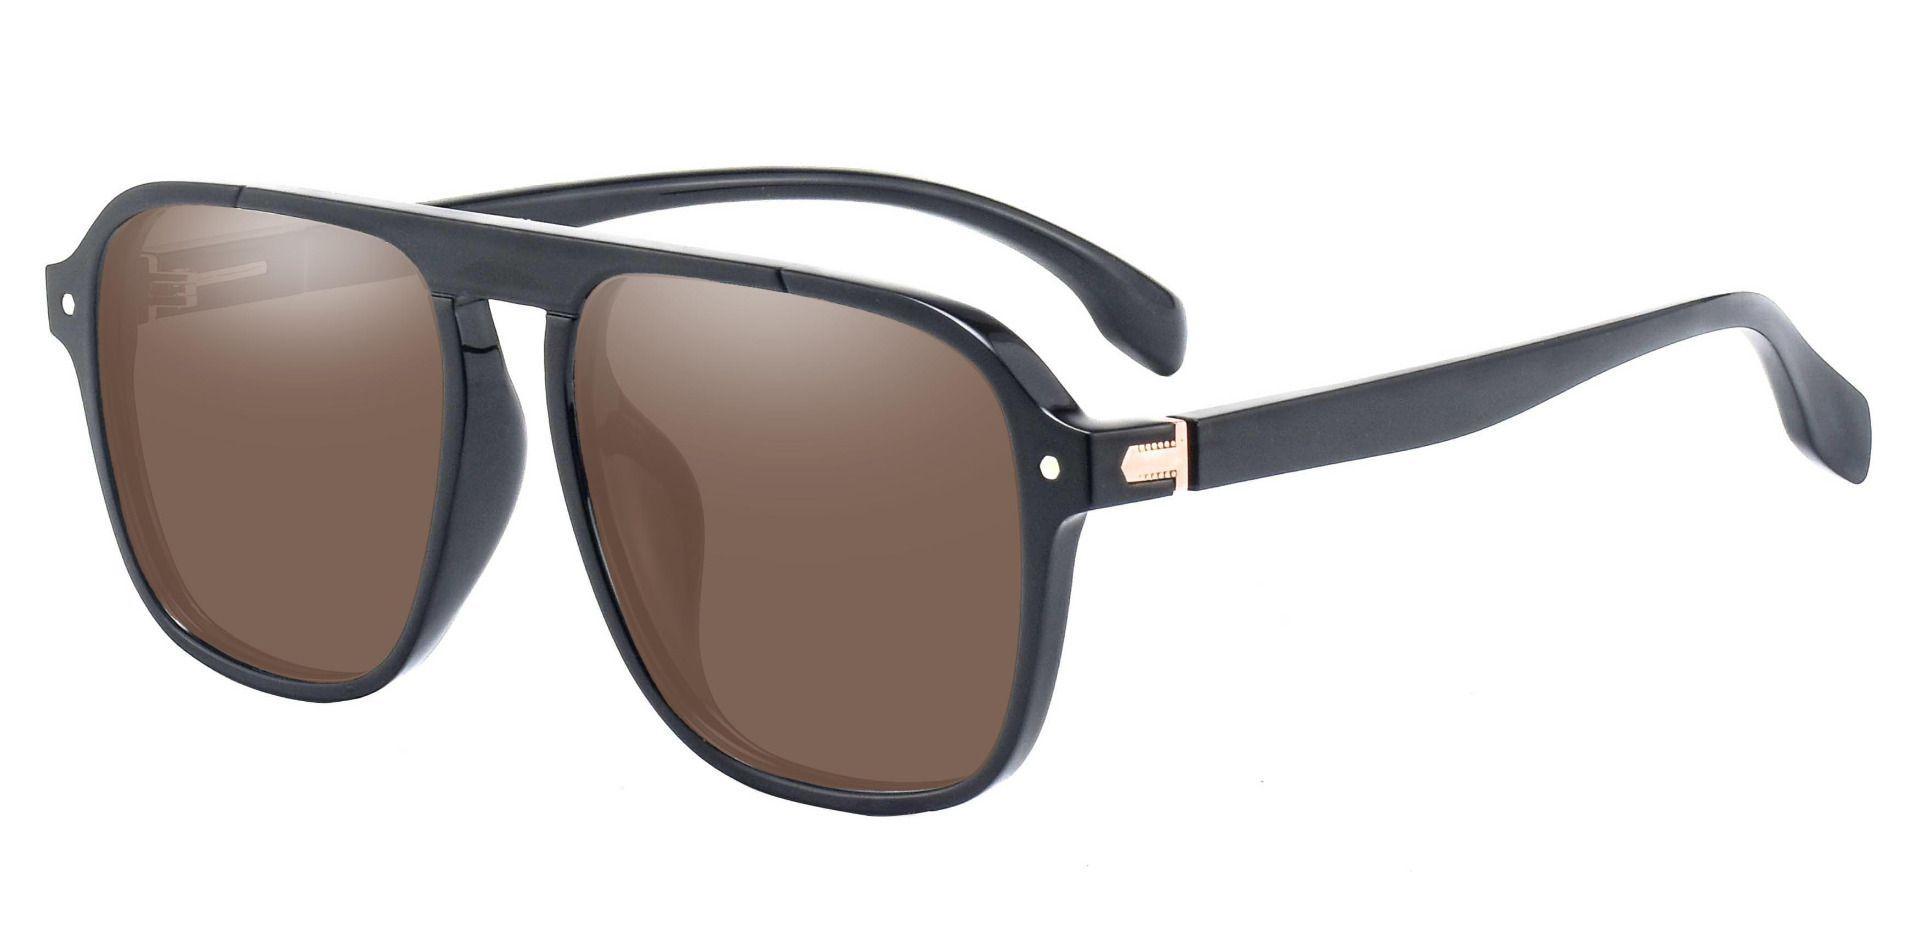 Gideon Aviator Non-Rx Sunglasses - Black Frame With Brown Lenses